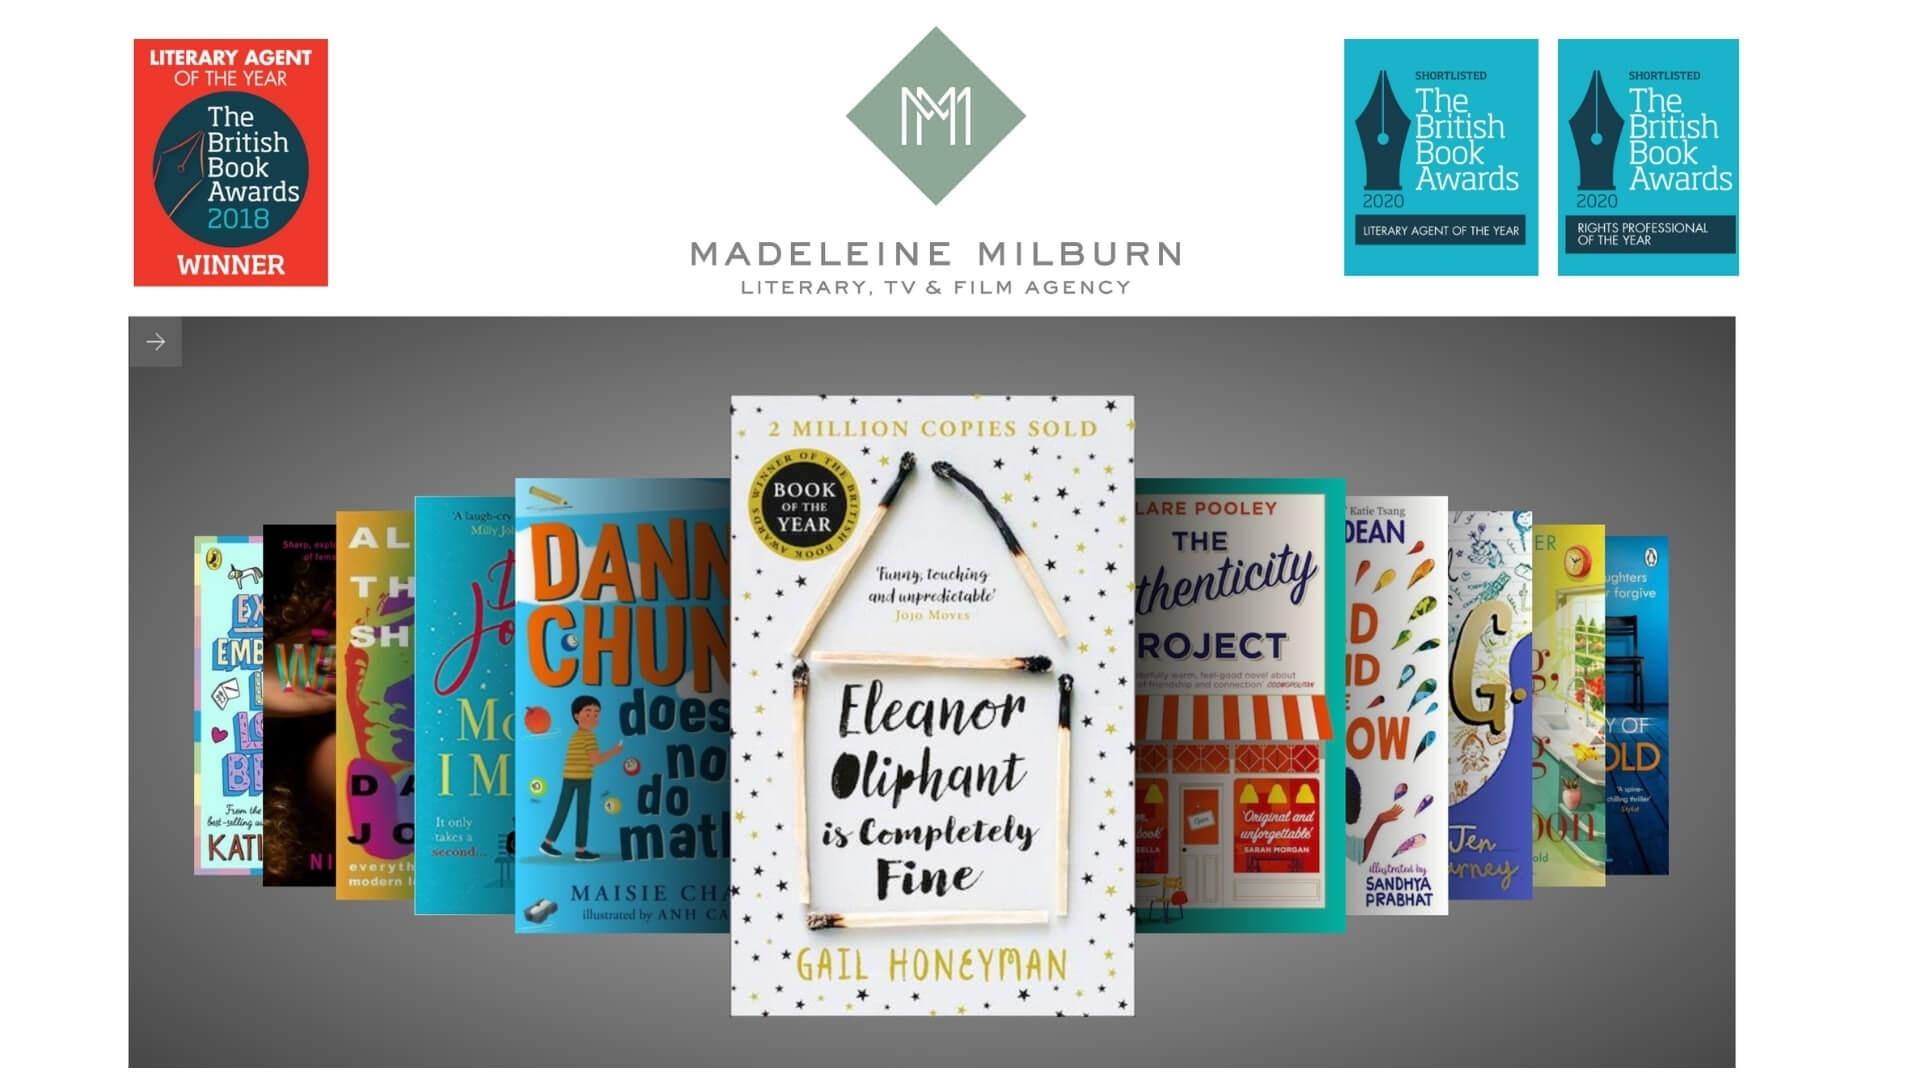 Madeleine Milburn Literary Agency